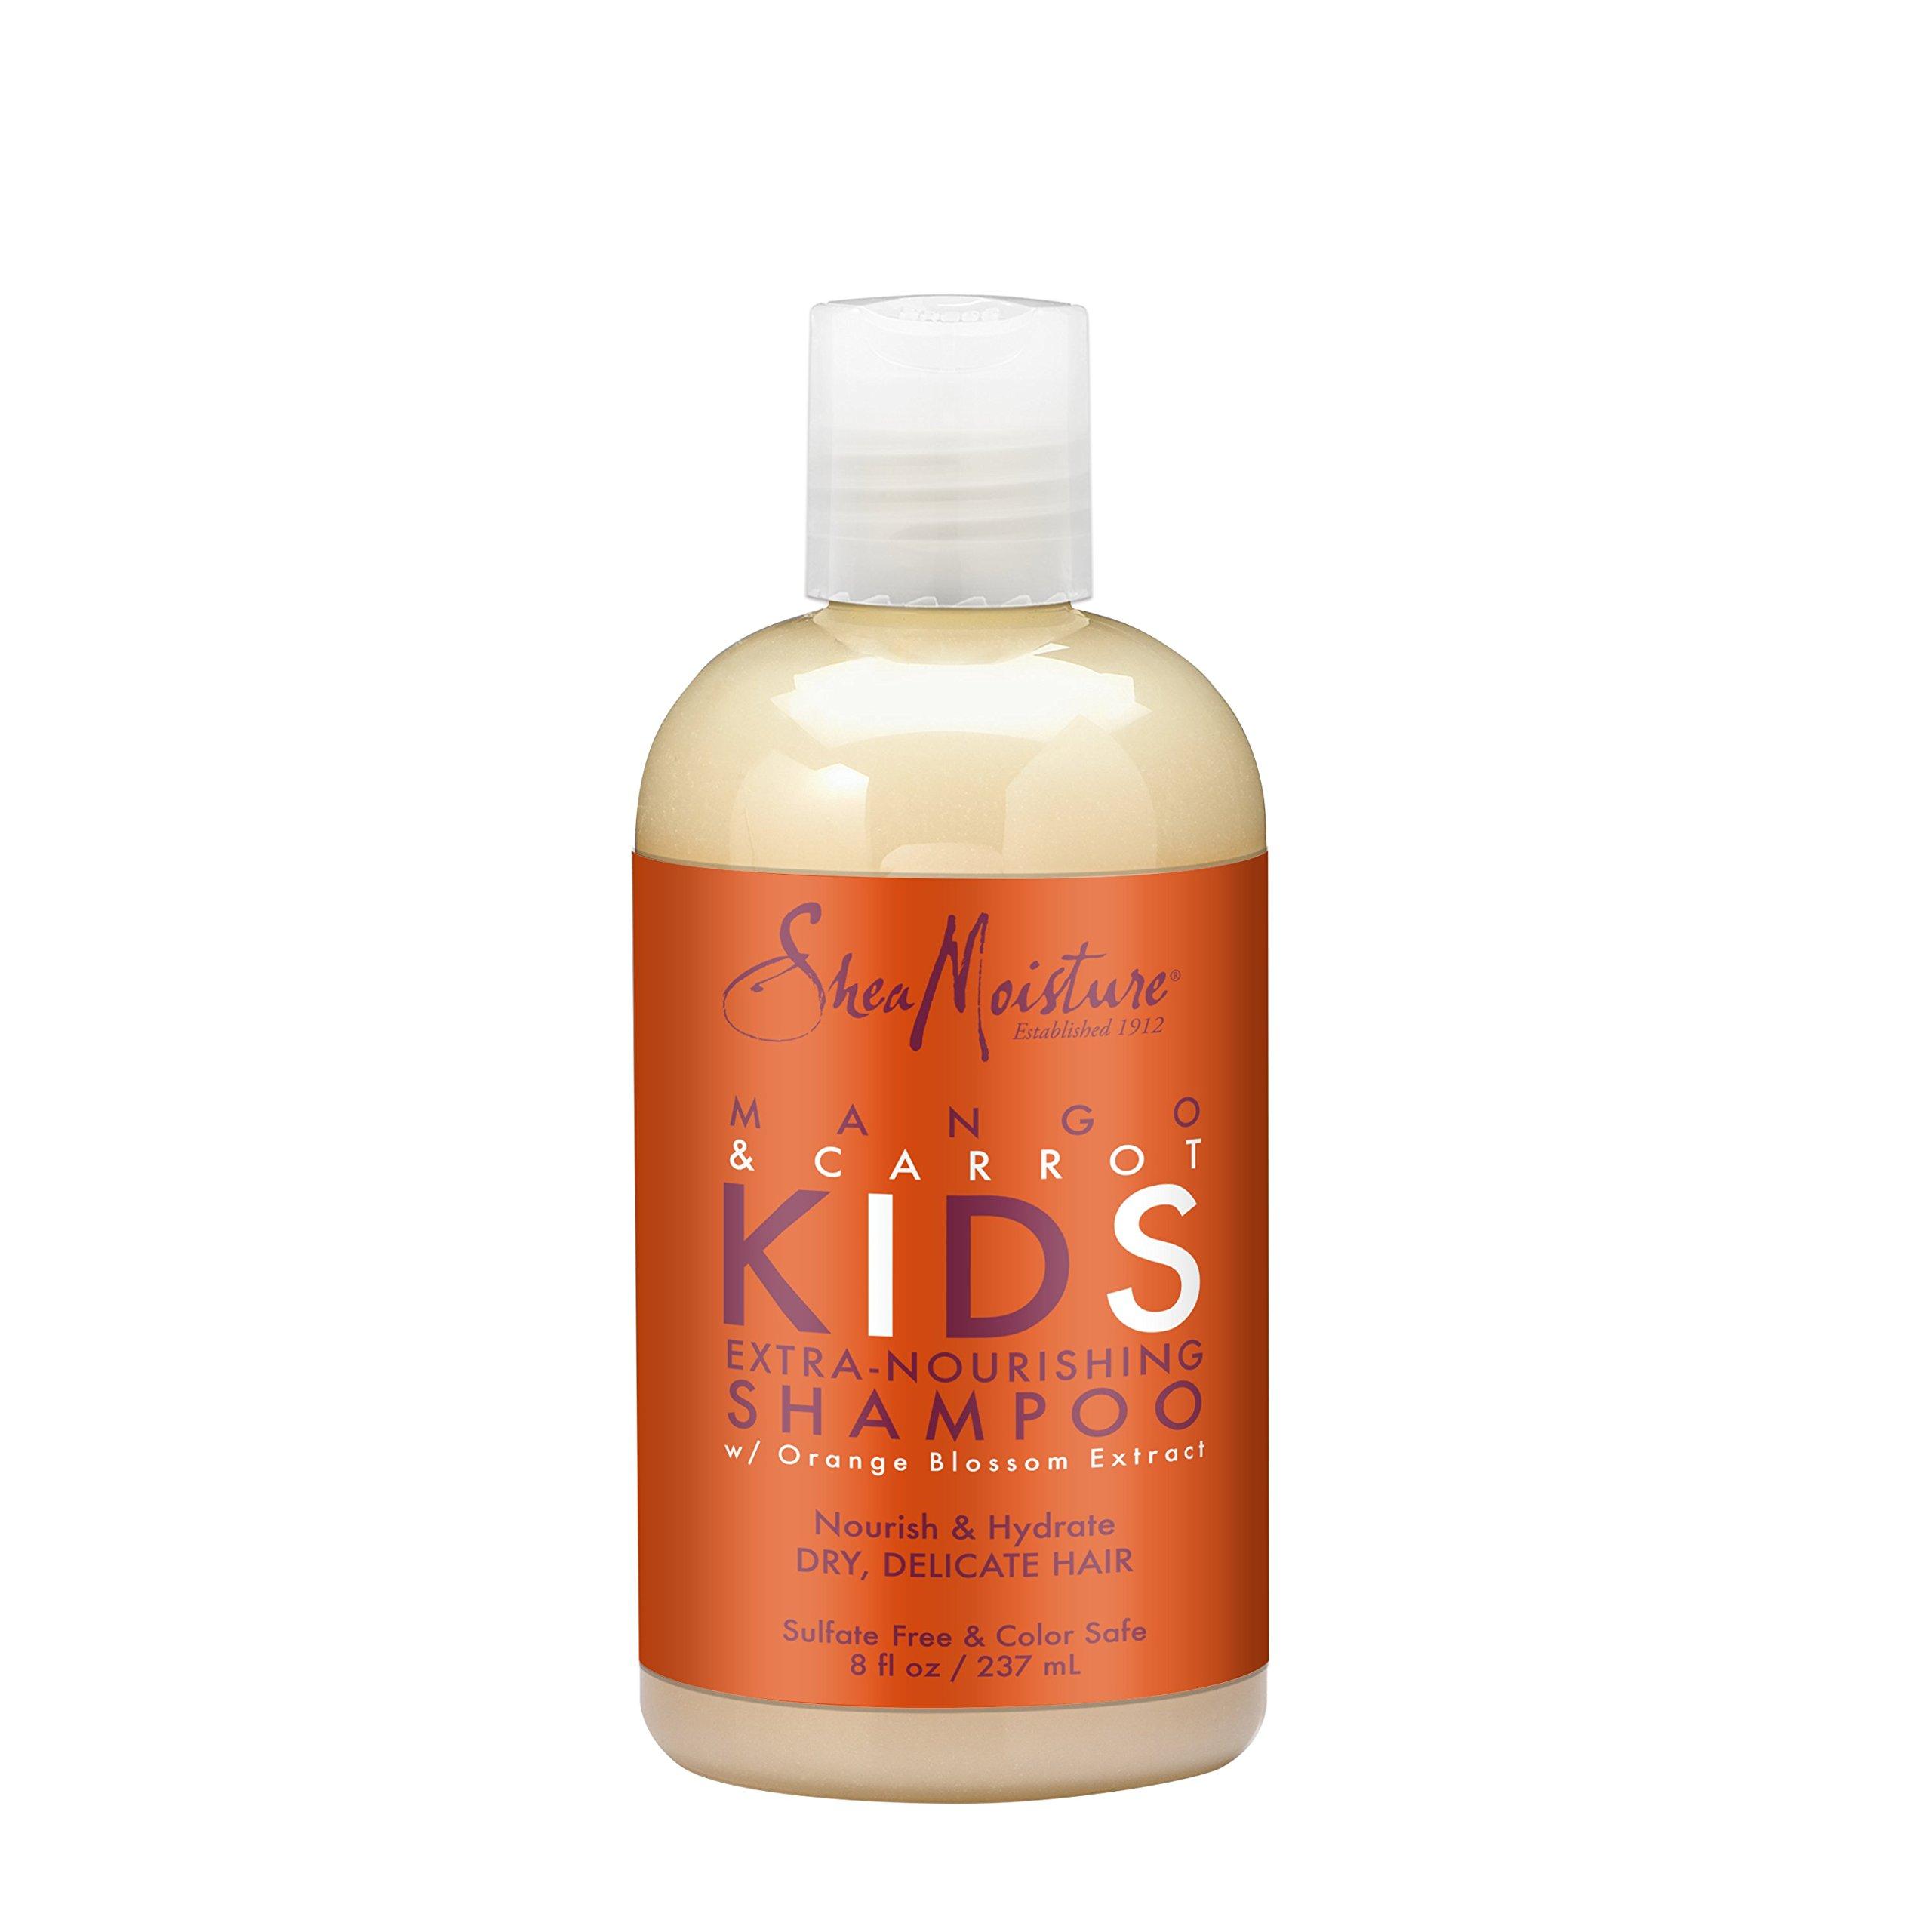 Amazon.com : Shea Moisture Kids Extra-nourishing